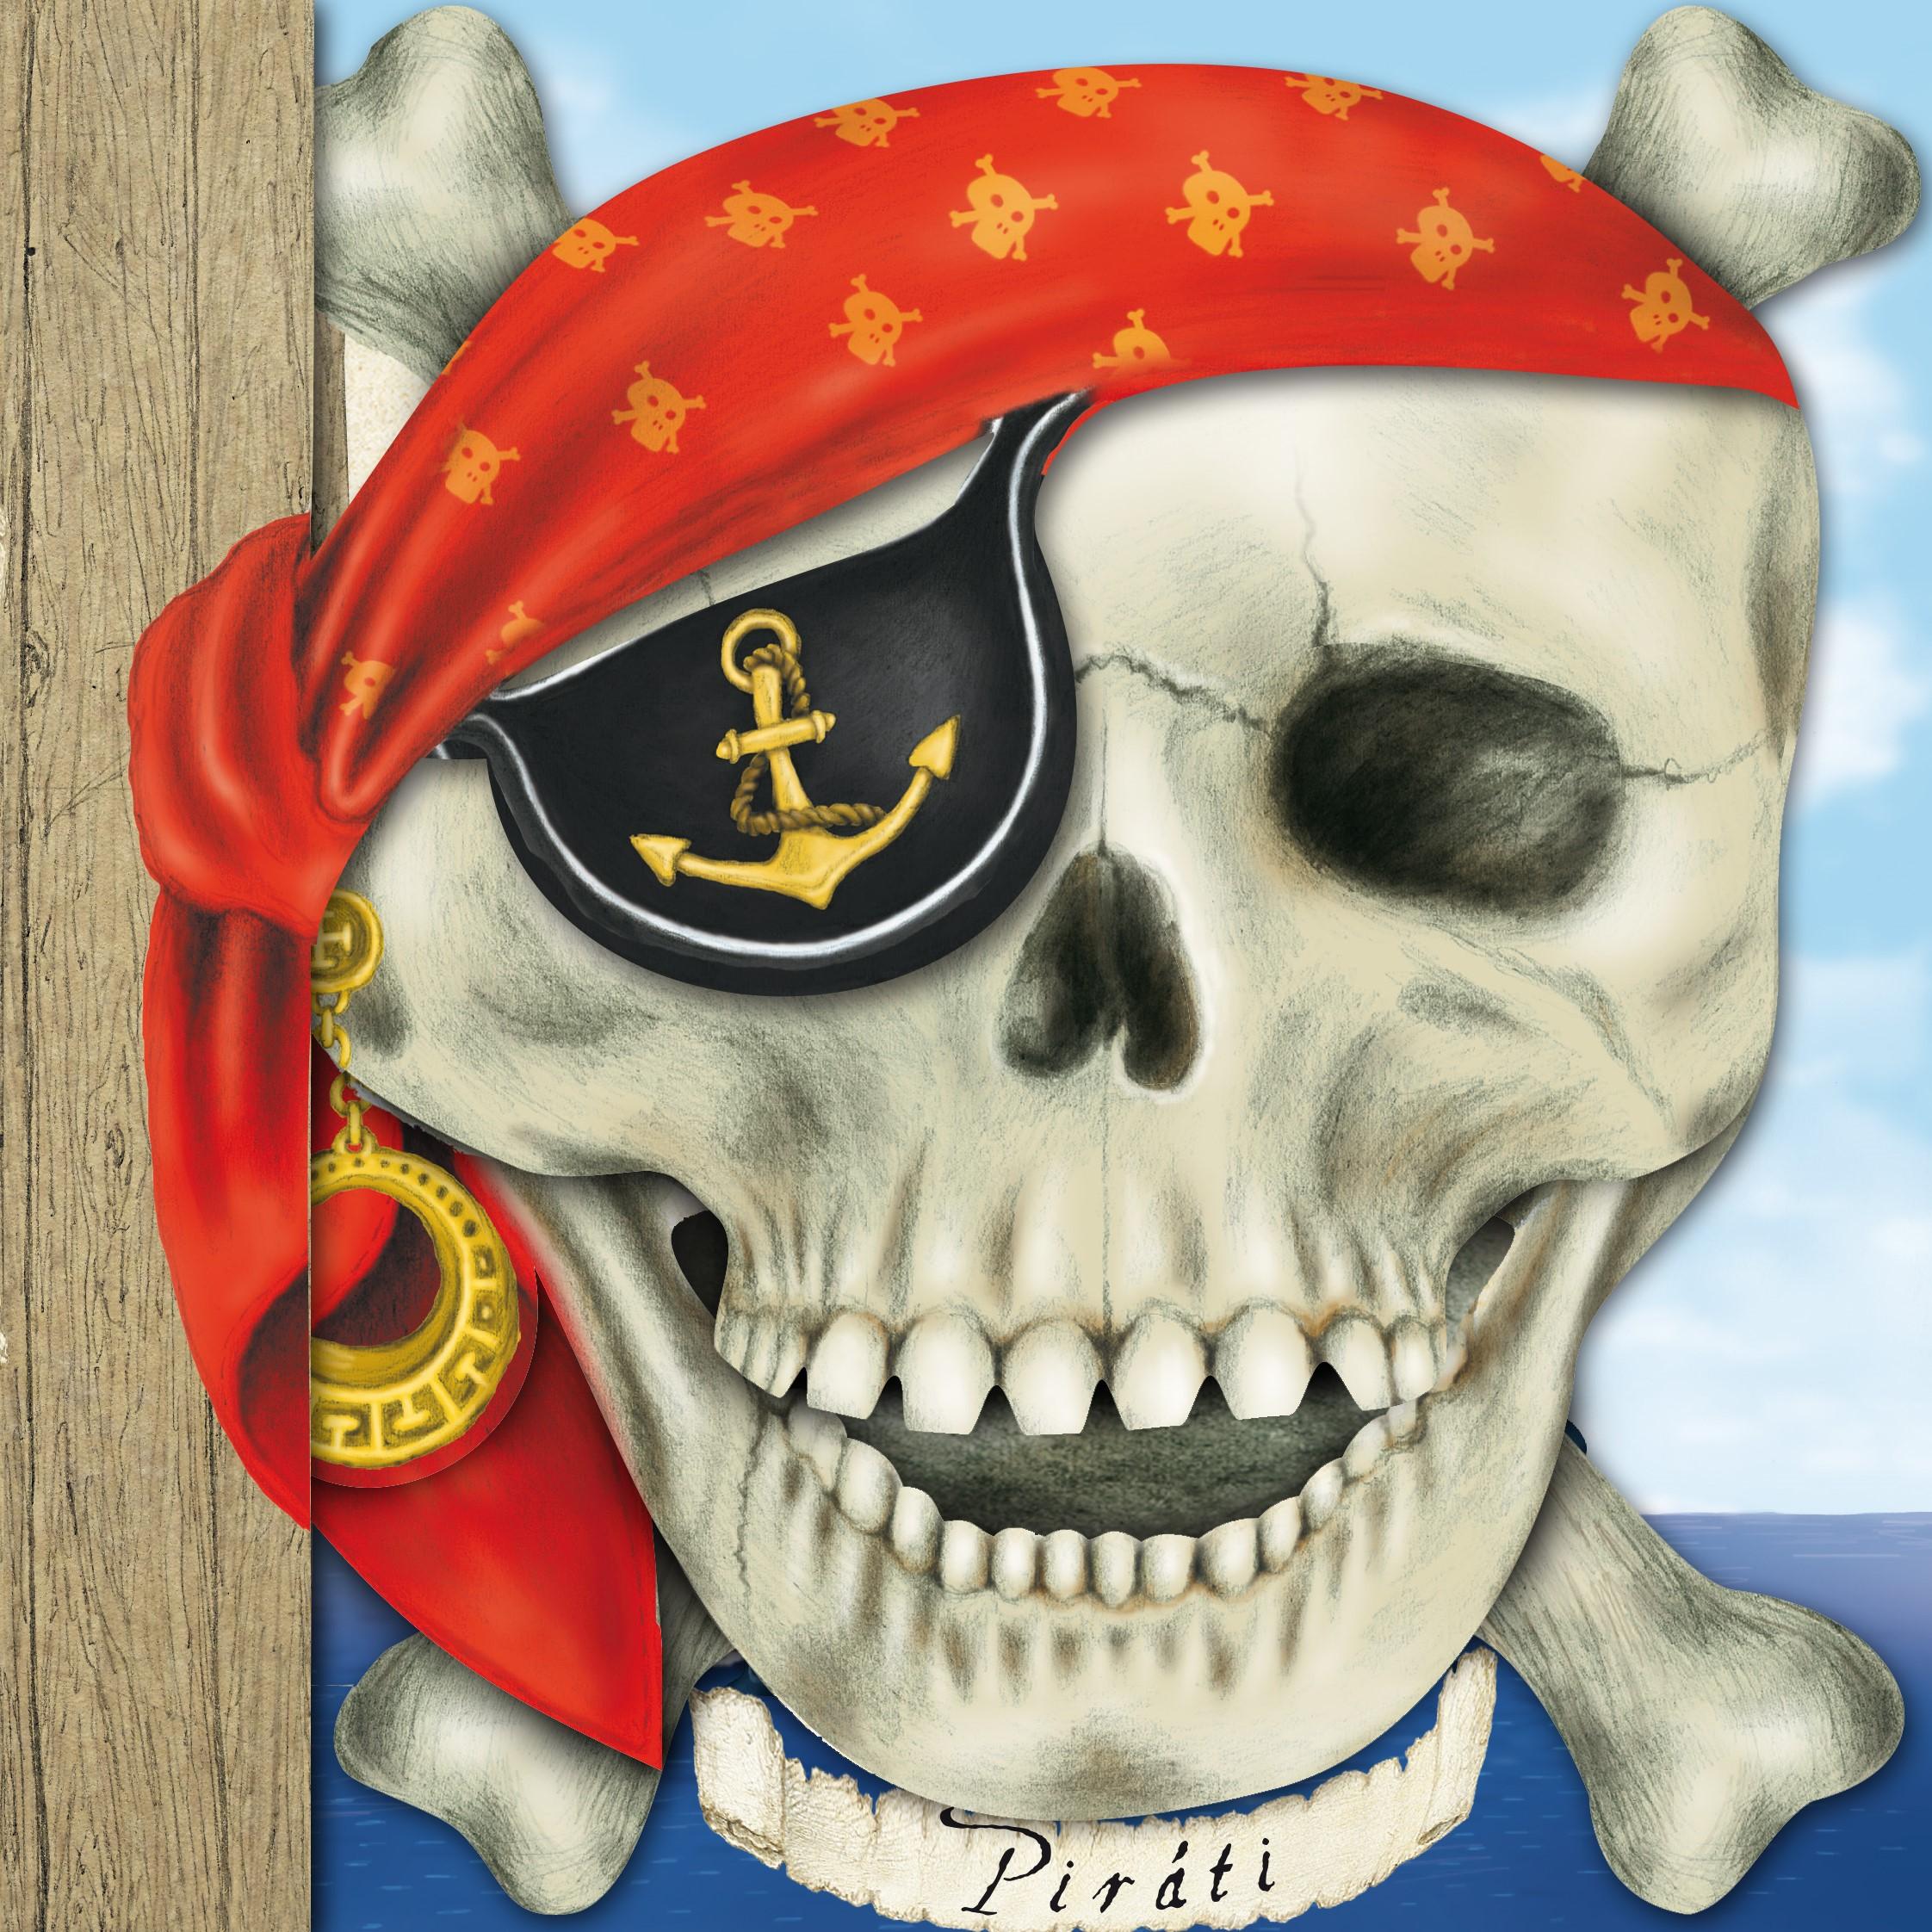 Poklad Kulhavého Jacka - Piráti   Oldřich Růžička